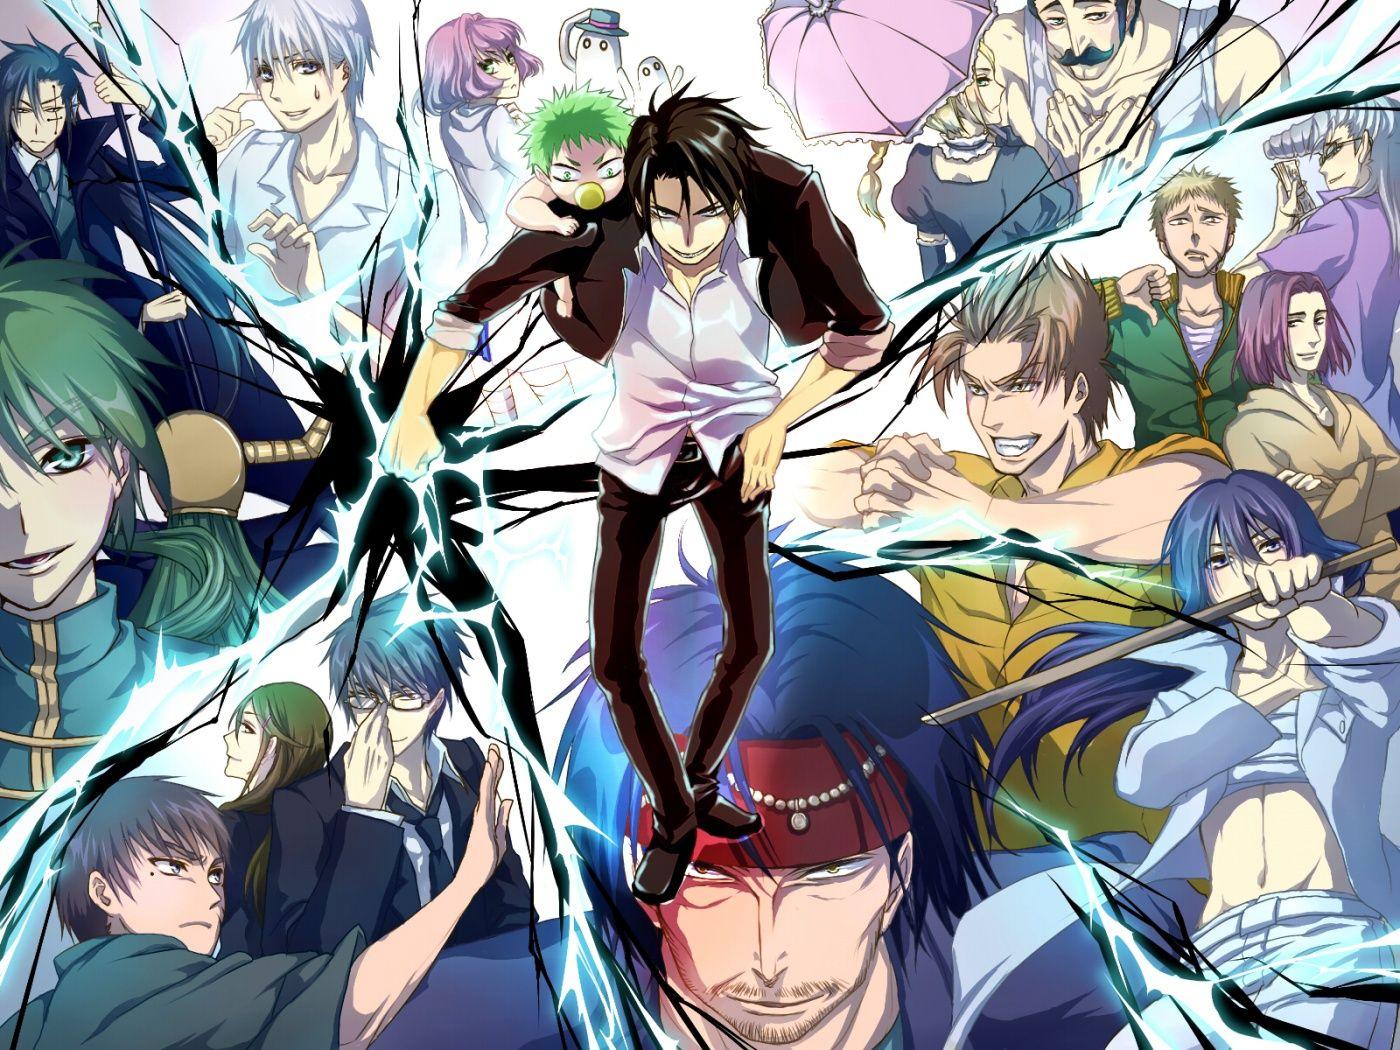 Anime Beelzebub Full Downloads Free Hd Anime, Beelzebub